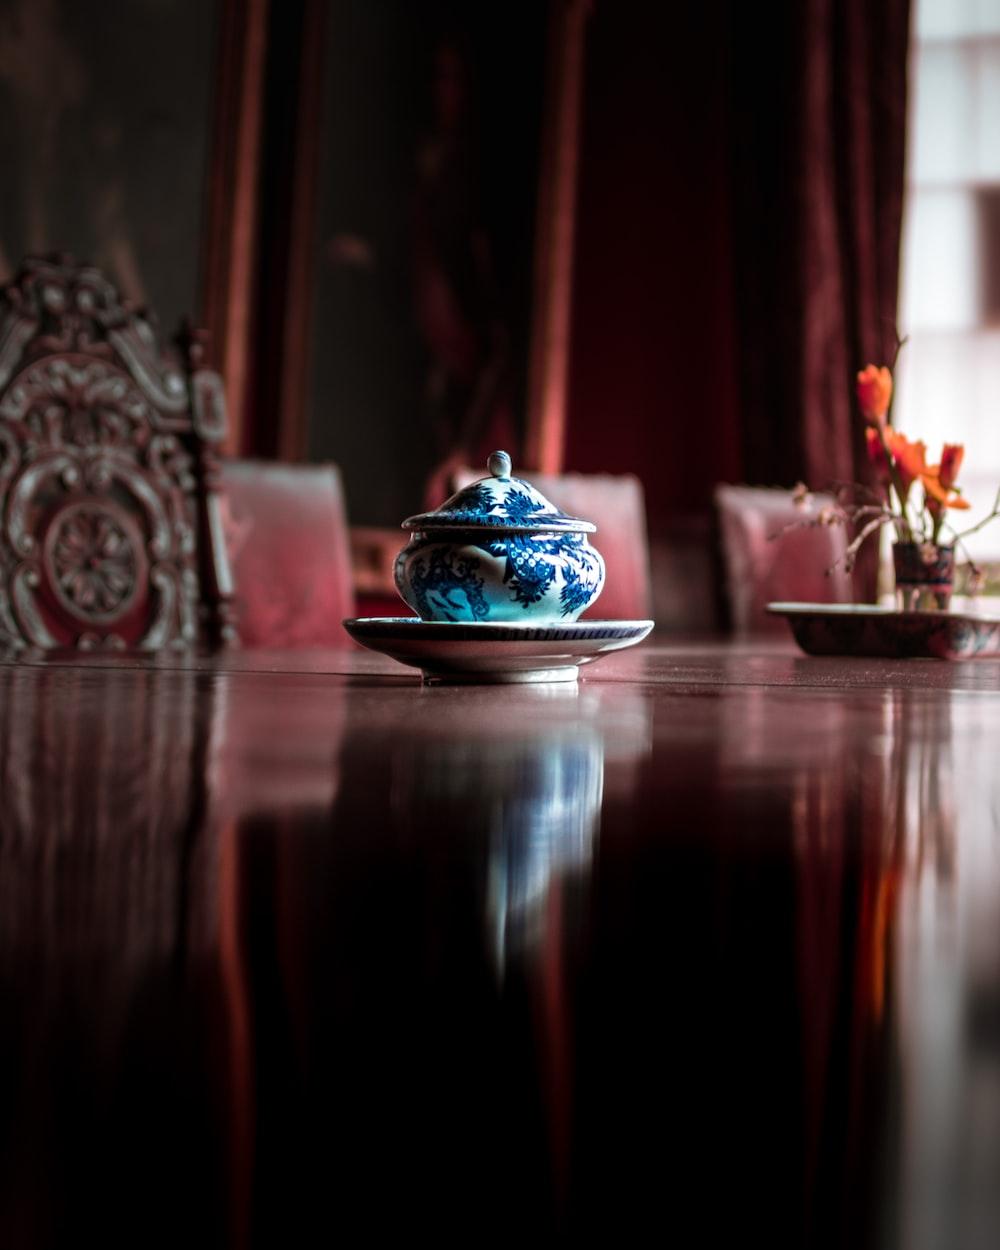 blue floral jar with saucer